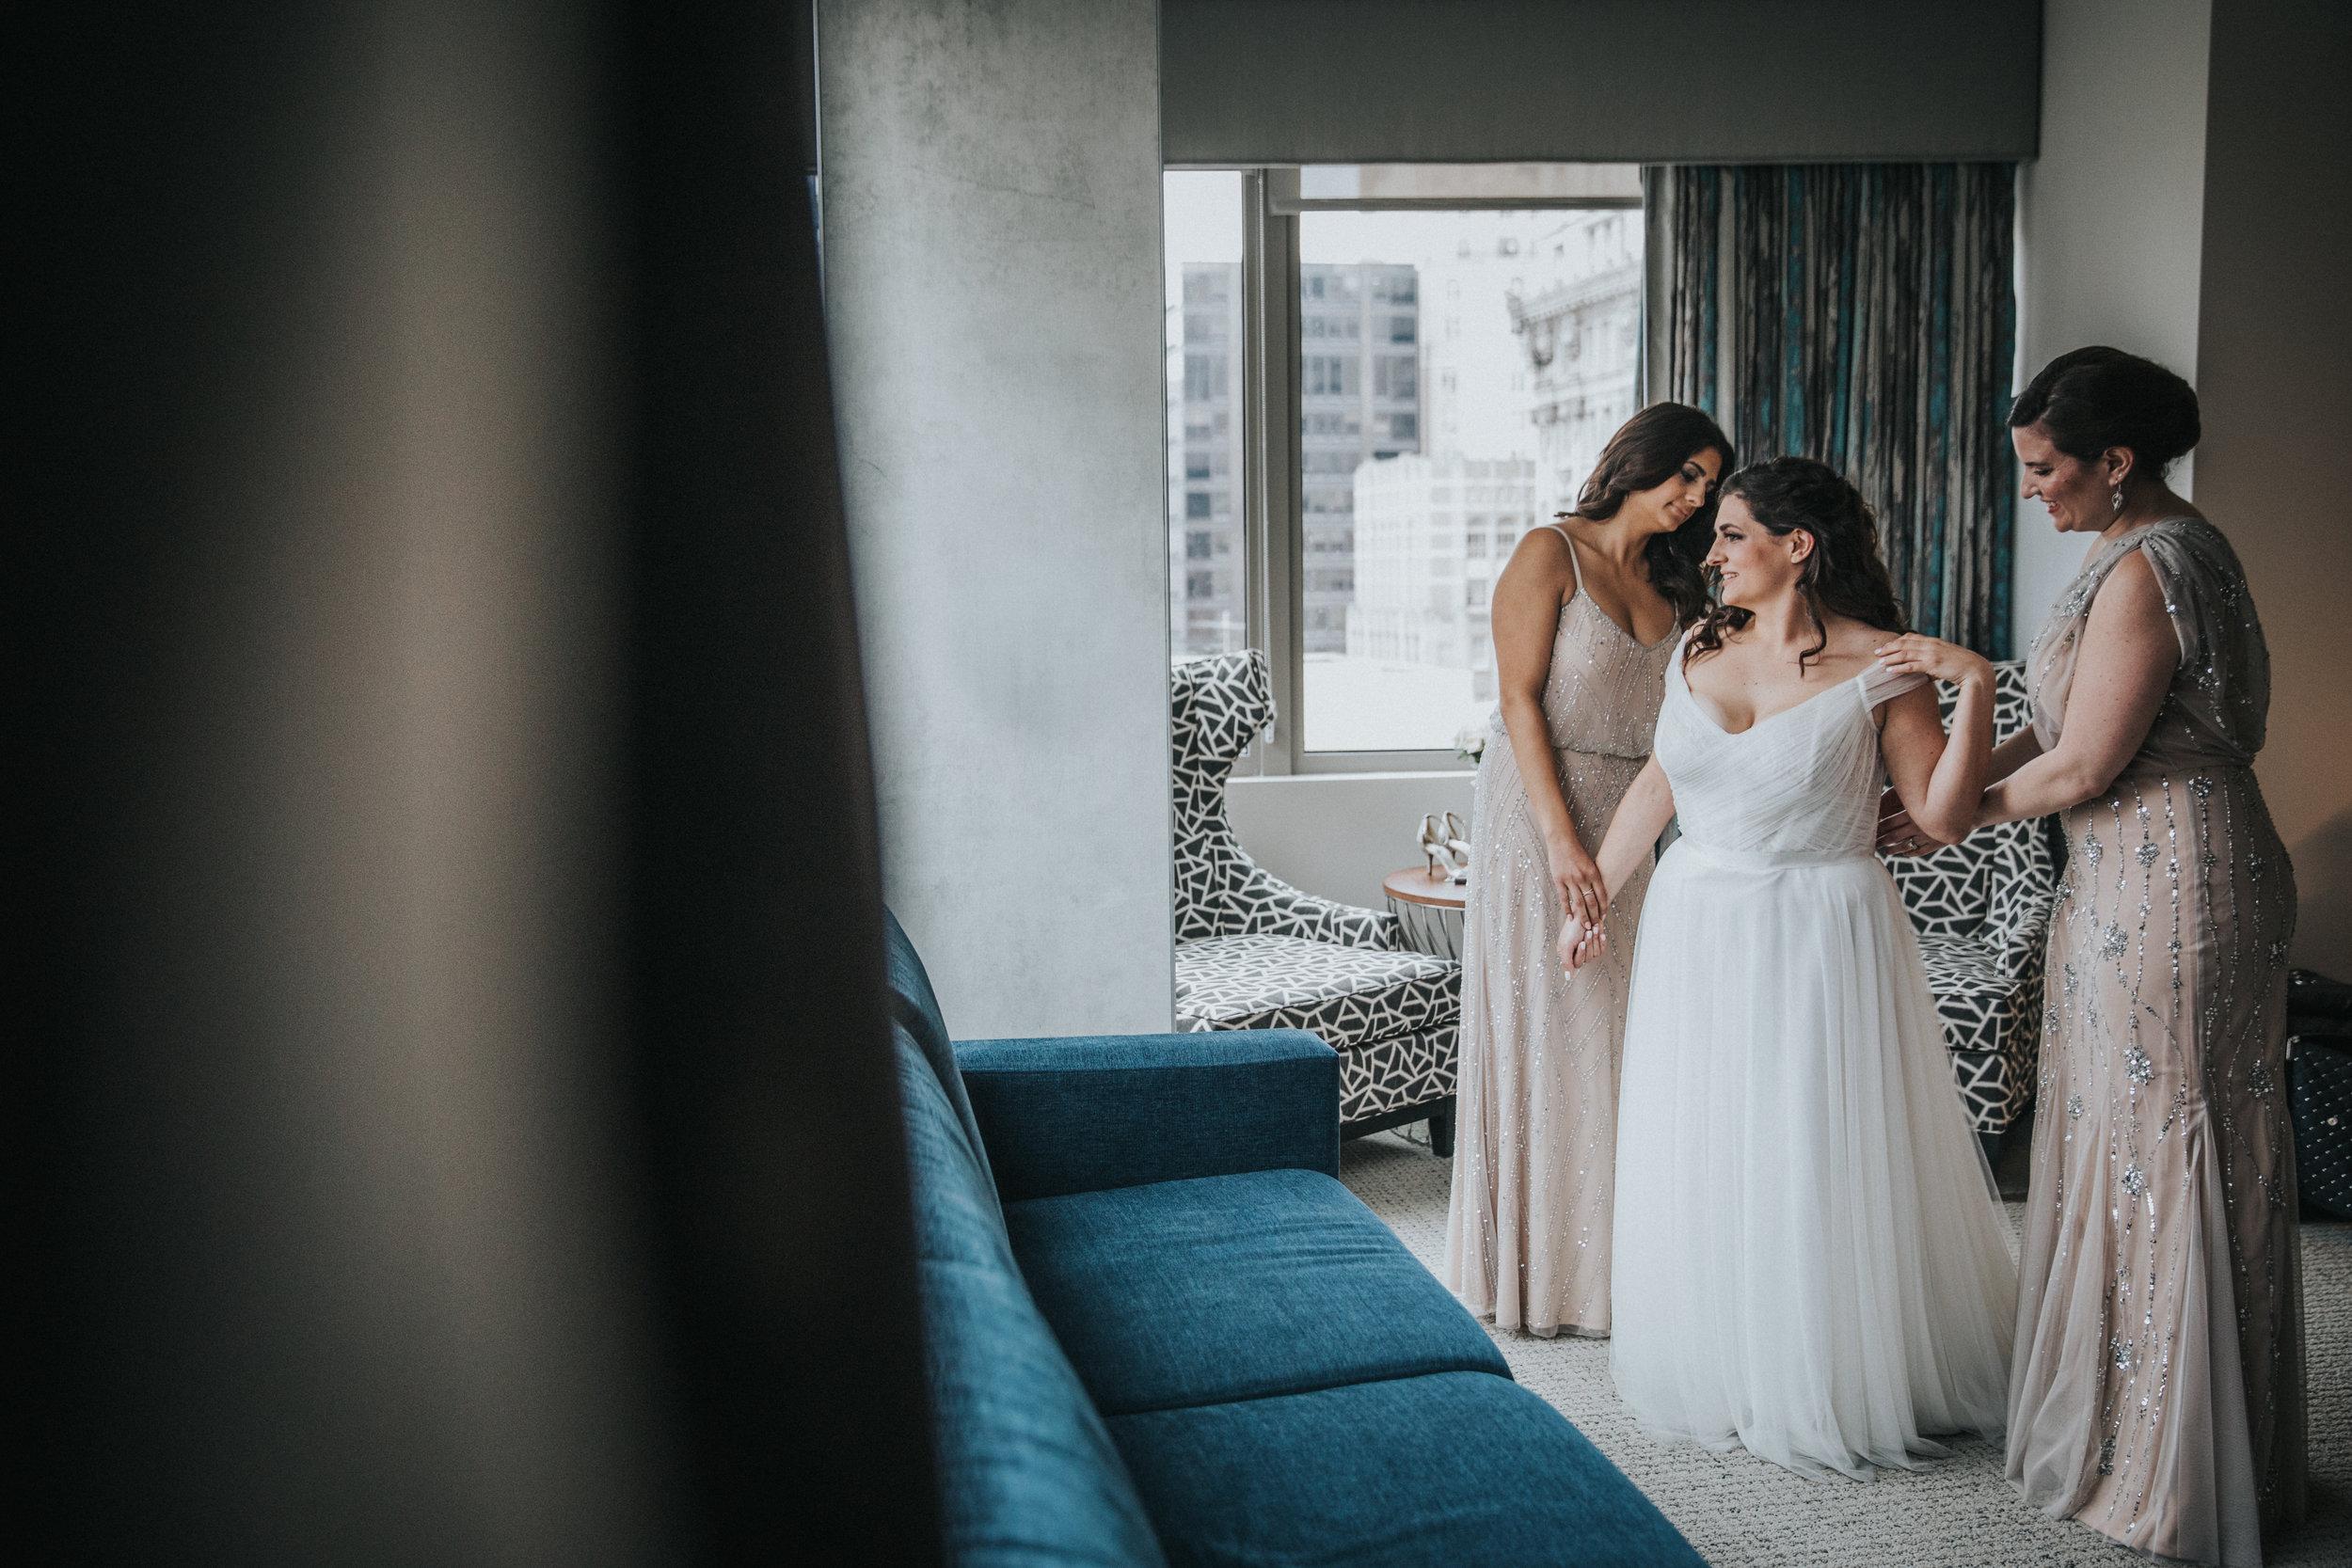 JennaLynnPhotography-NJWeddingPhotographer-Philadelphia-Wedding-ArtsBallroom-GettingReady-42.jpg